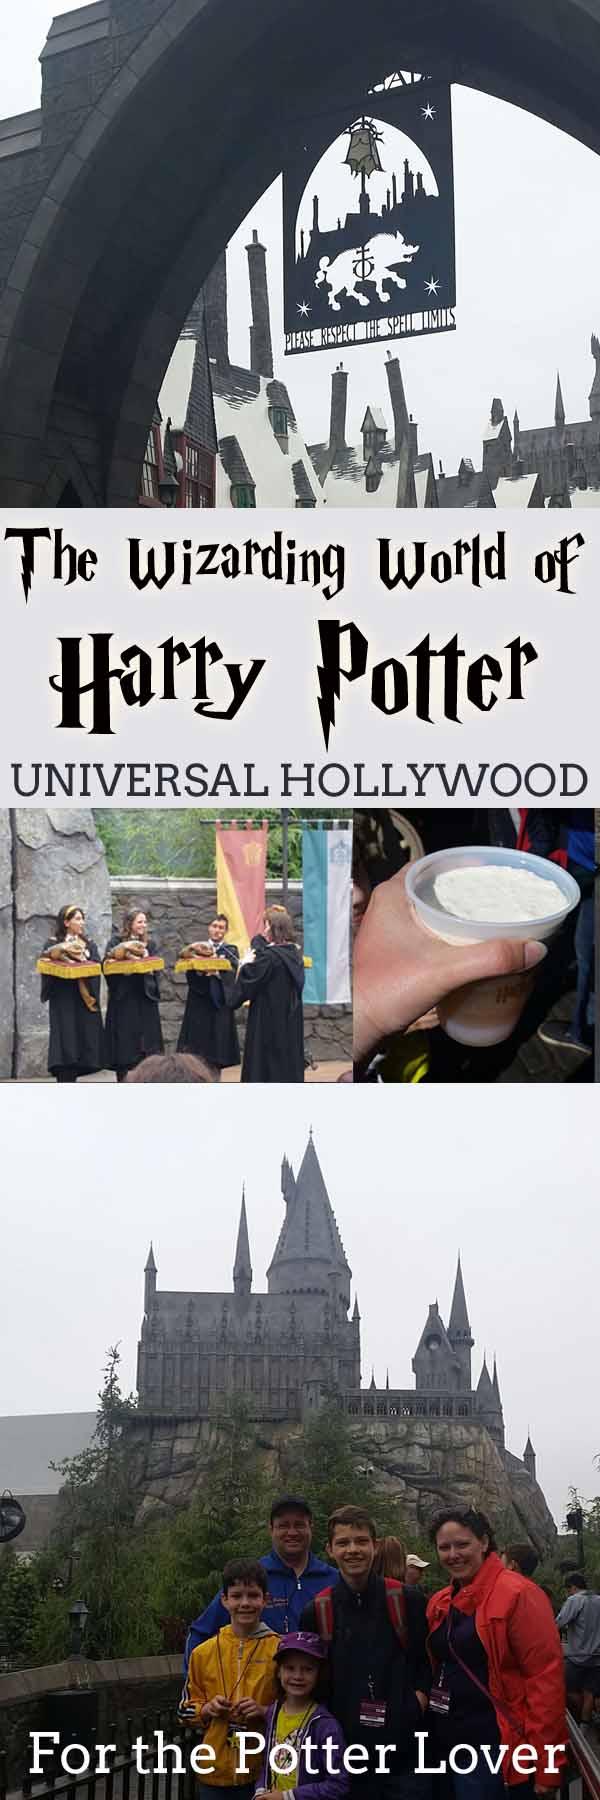 Harry Potter world hollywood, Harry Potter World California, Wizarding World of Harry Potter tips, Wizarding World of Harry Potter Secrets via @pullingcurls